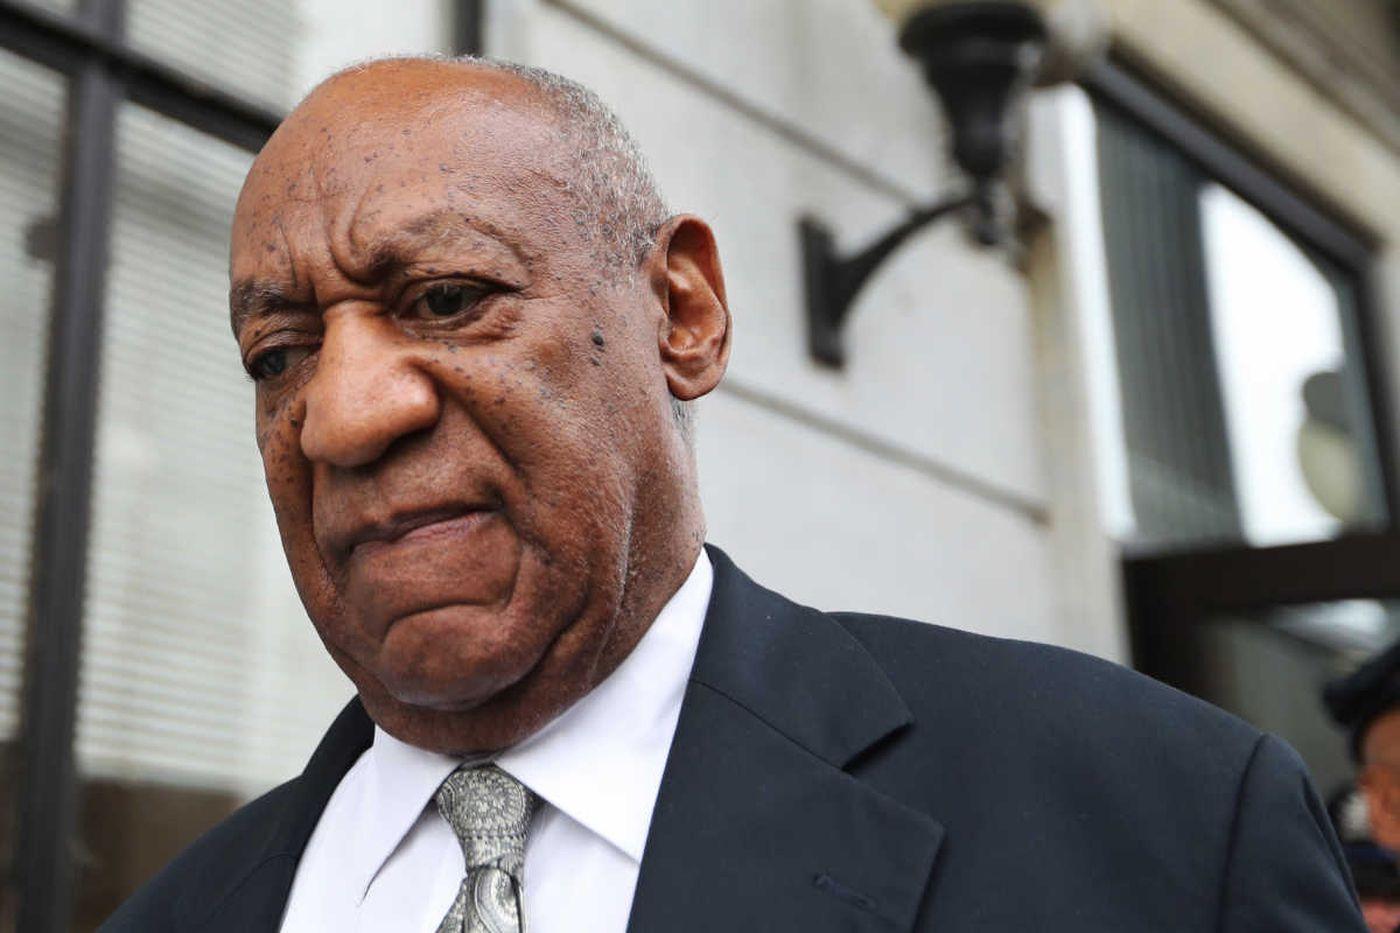 Judge orders Nov. 6 start for Bill Cosby retrial